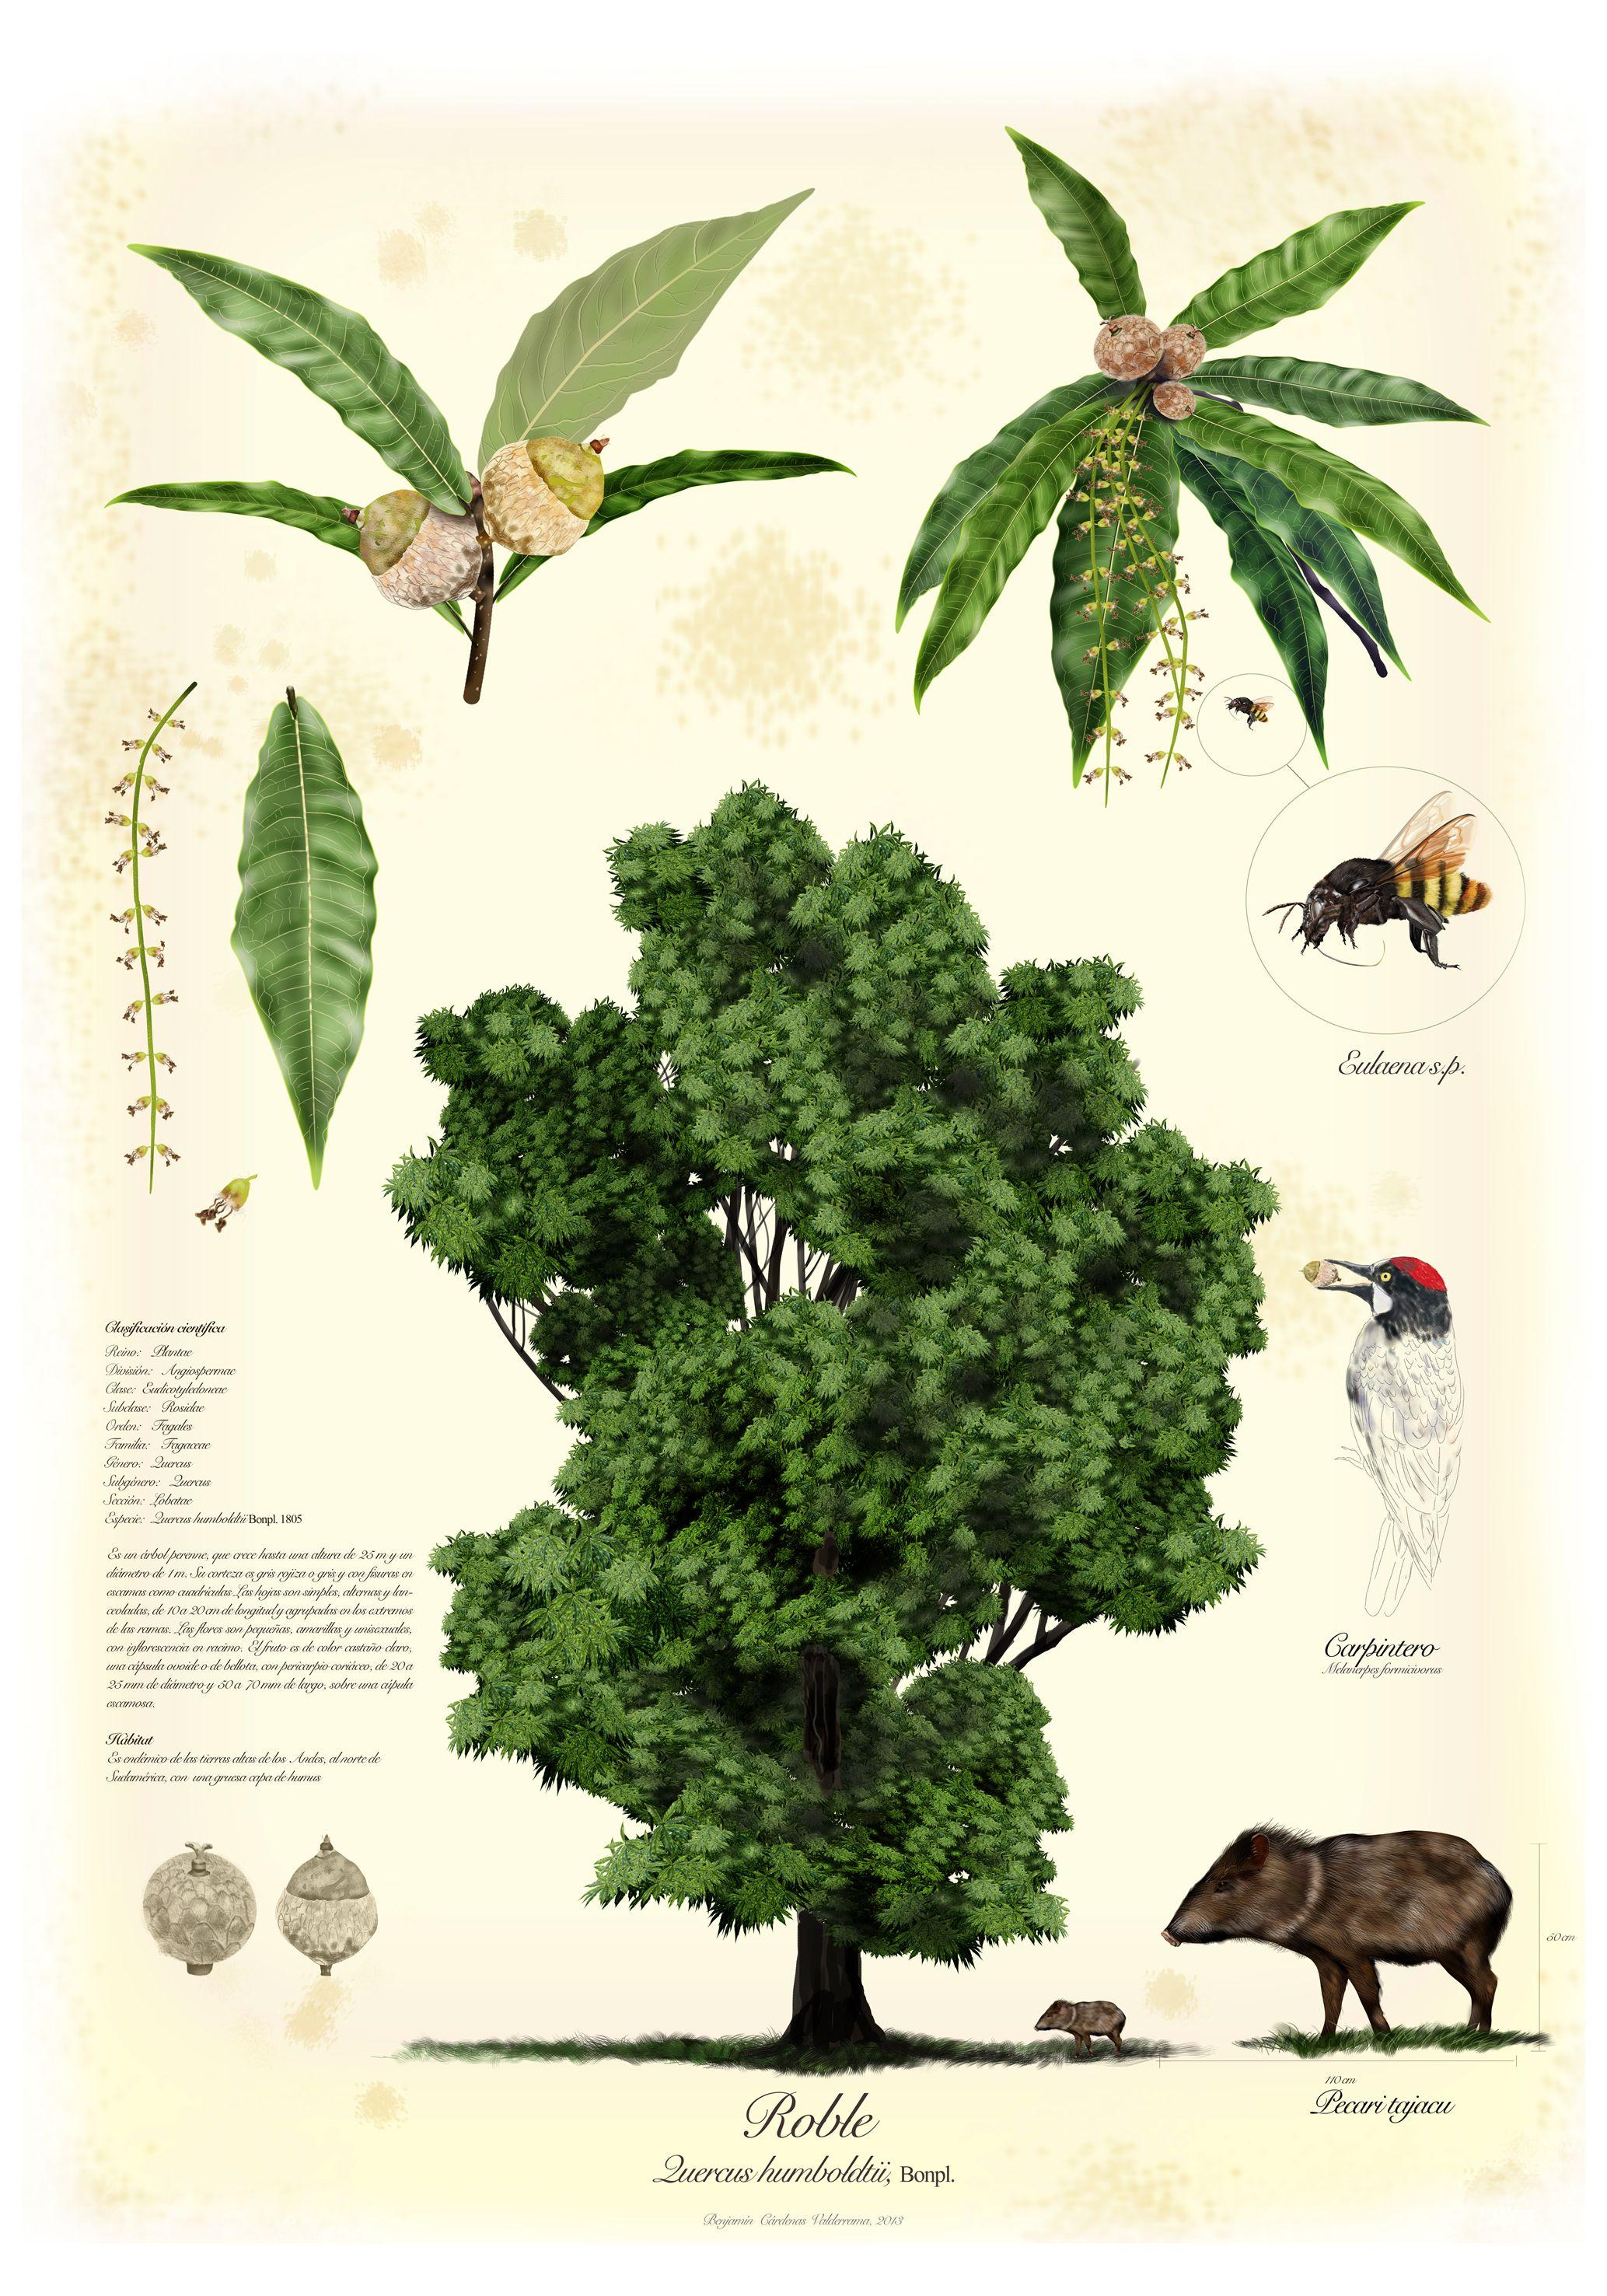 Quercus Humboldtii / Roble